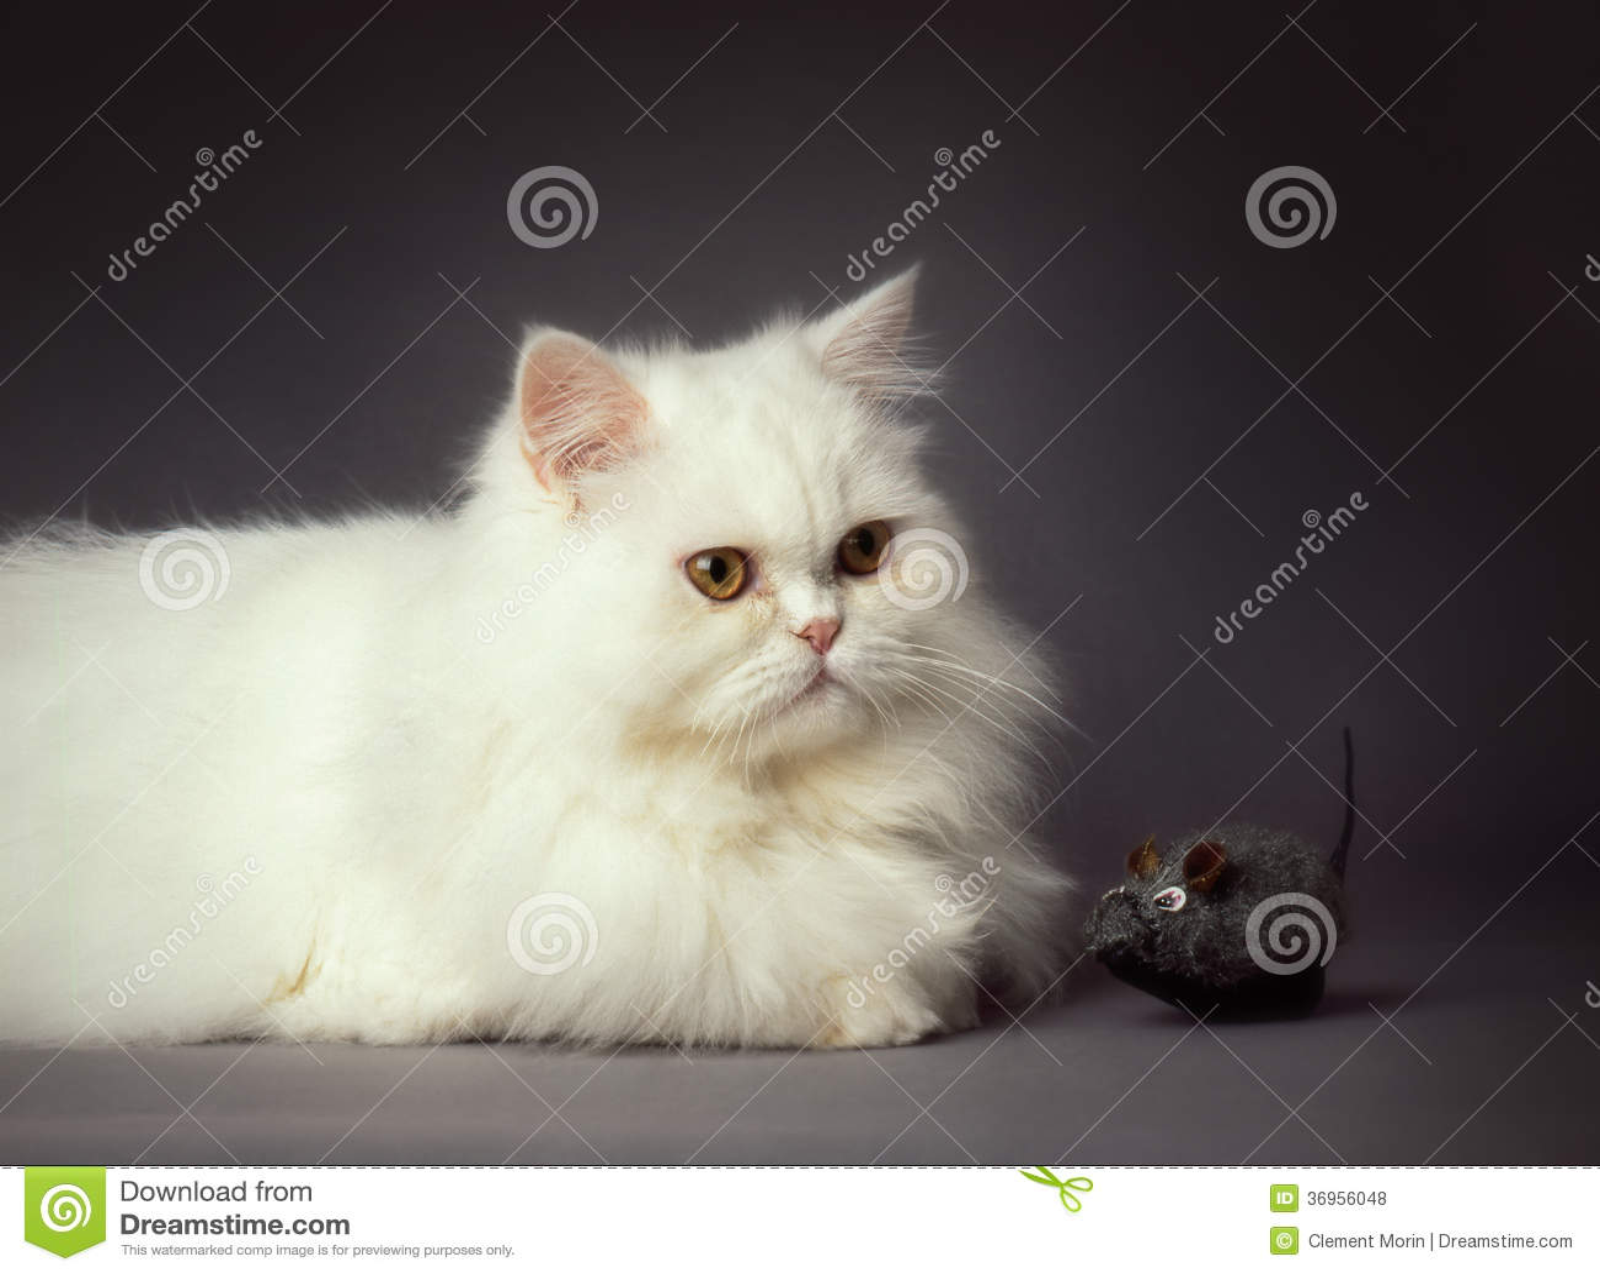 Purebreed Cat Pictures